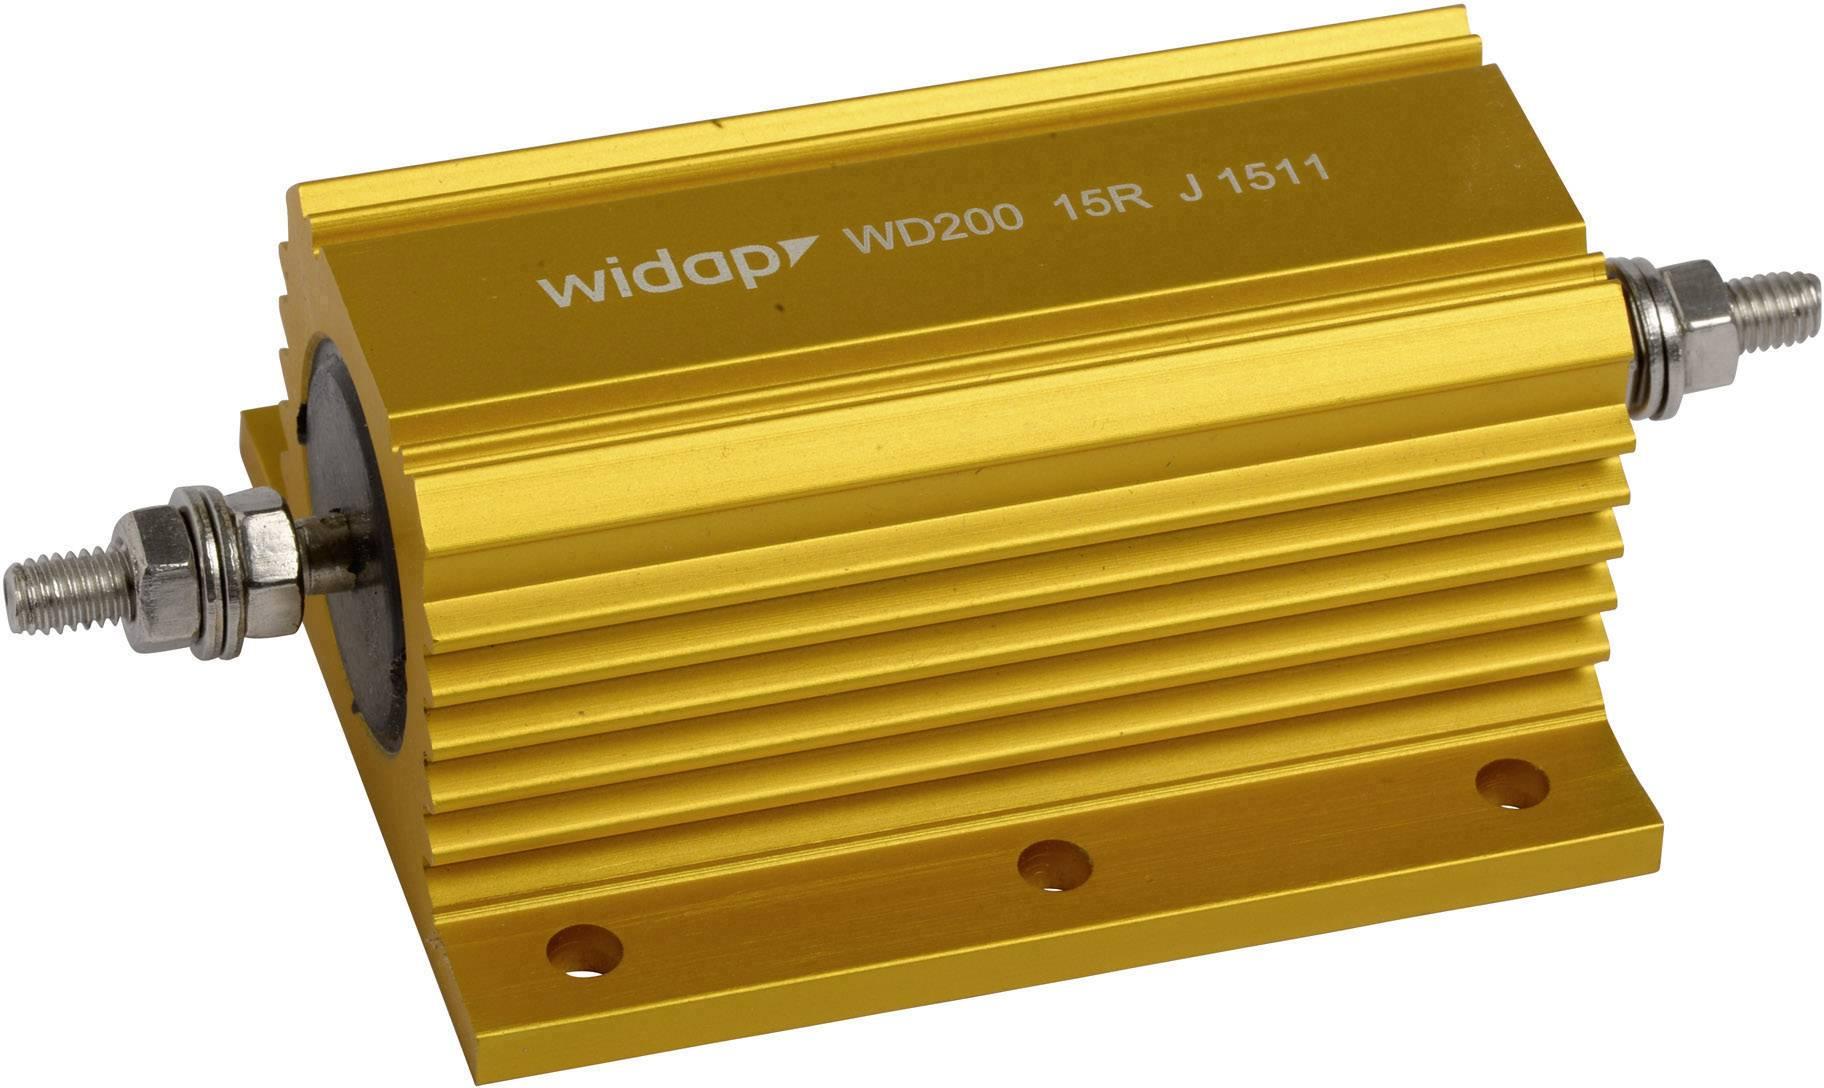 Drôtový rezistor Widap 160174, hodnota odporu 15 Ohm, 300 W, 1 ks